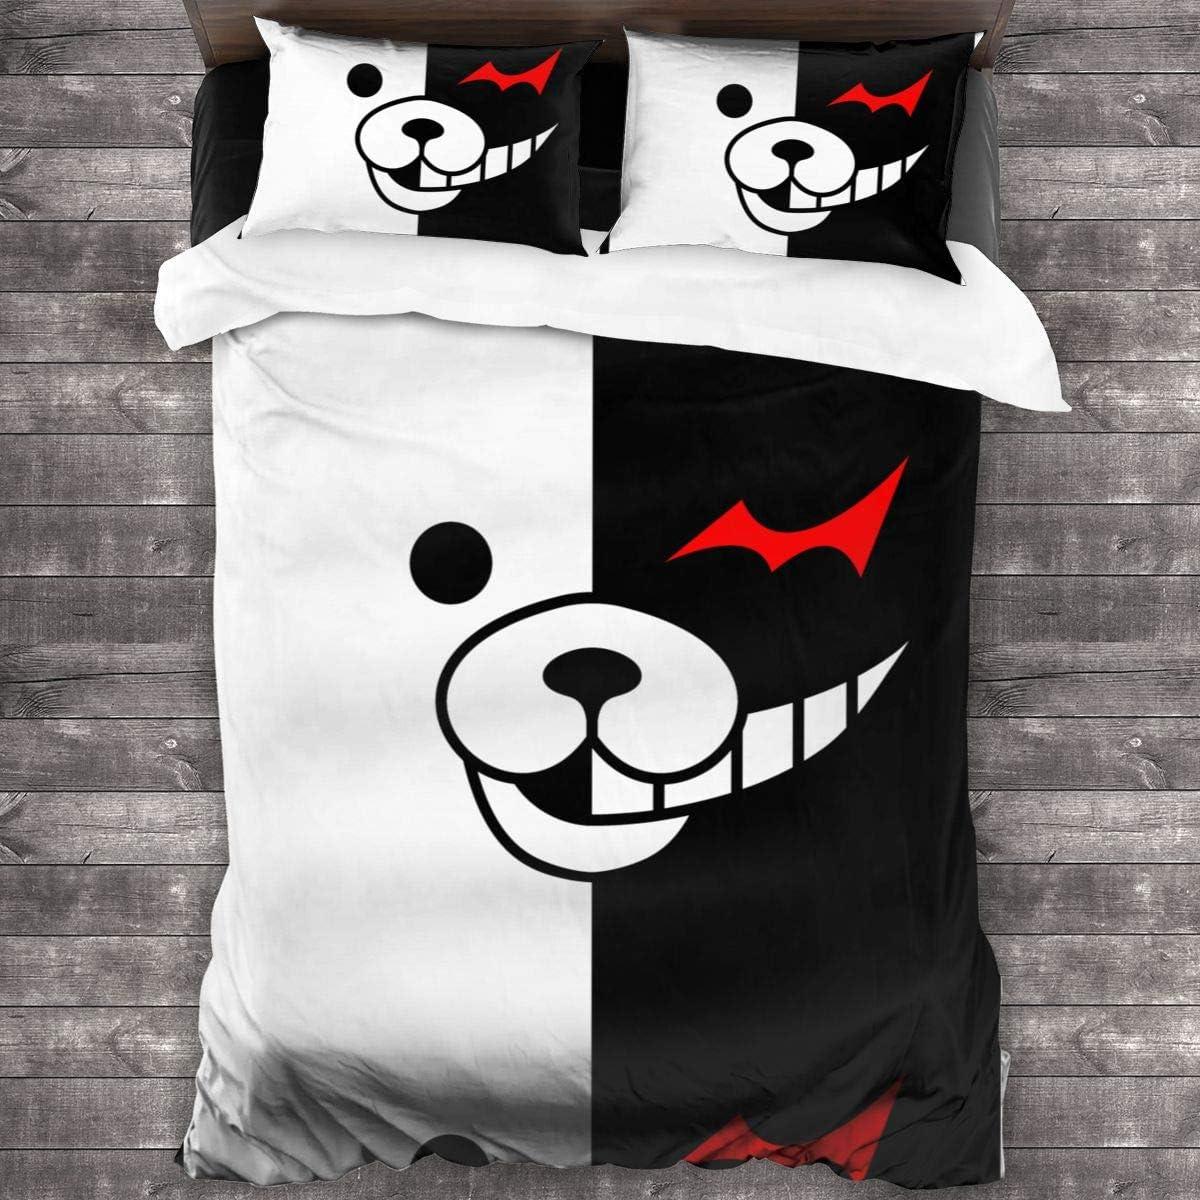 ,Twin for Teen Kids Children Adult Gift Bed Set No Comforter Hidreama Danganronpa-Monokuma 3Pcs Bedding Printing Duvet Cover Set Soft